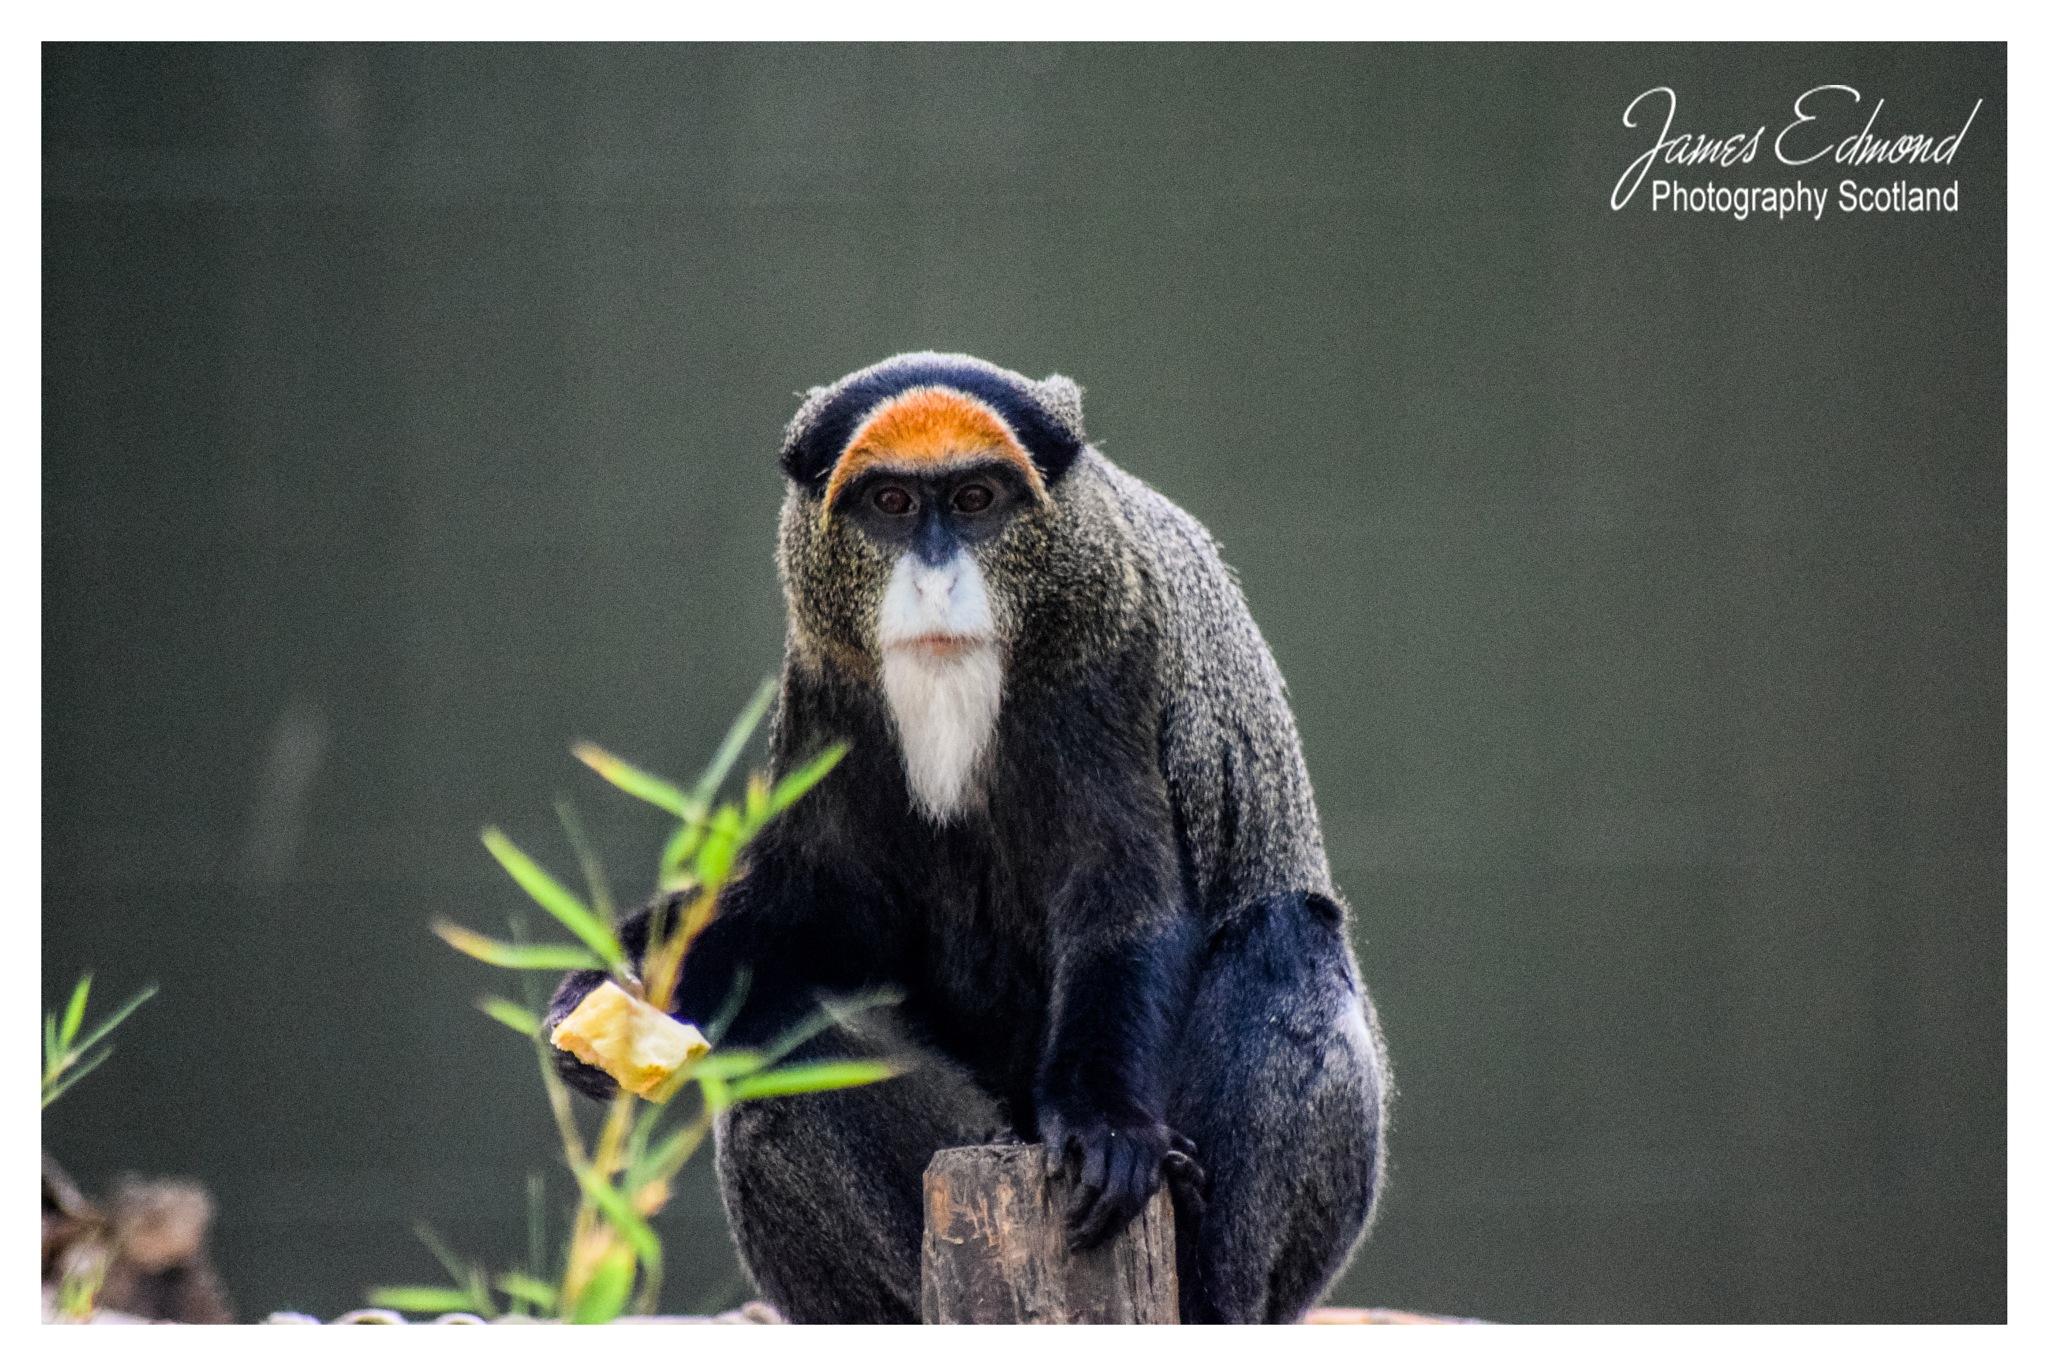 Monkey by James Edmond Photography